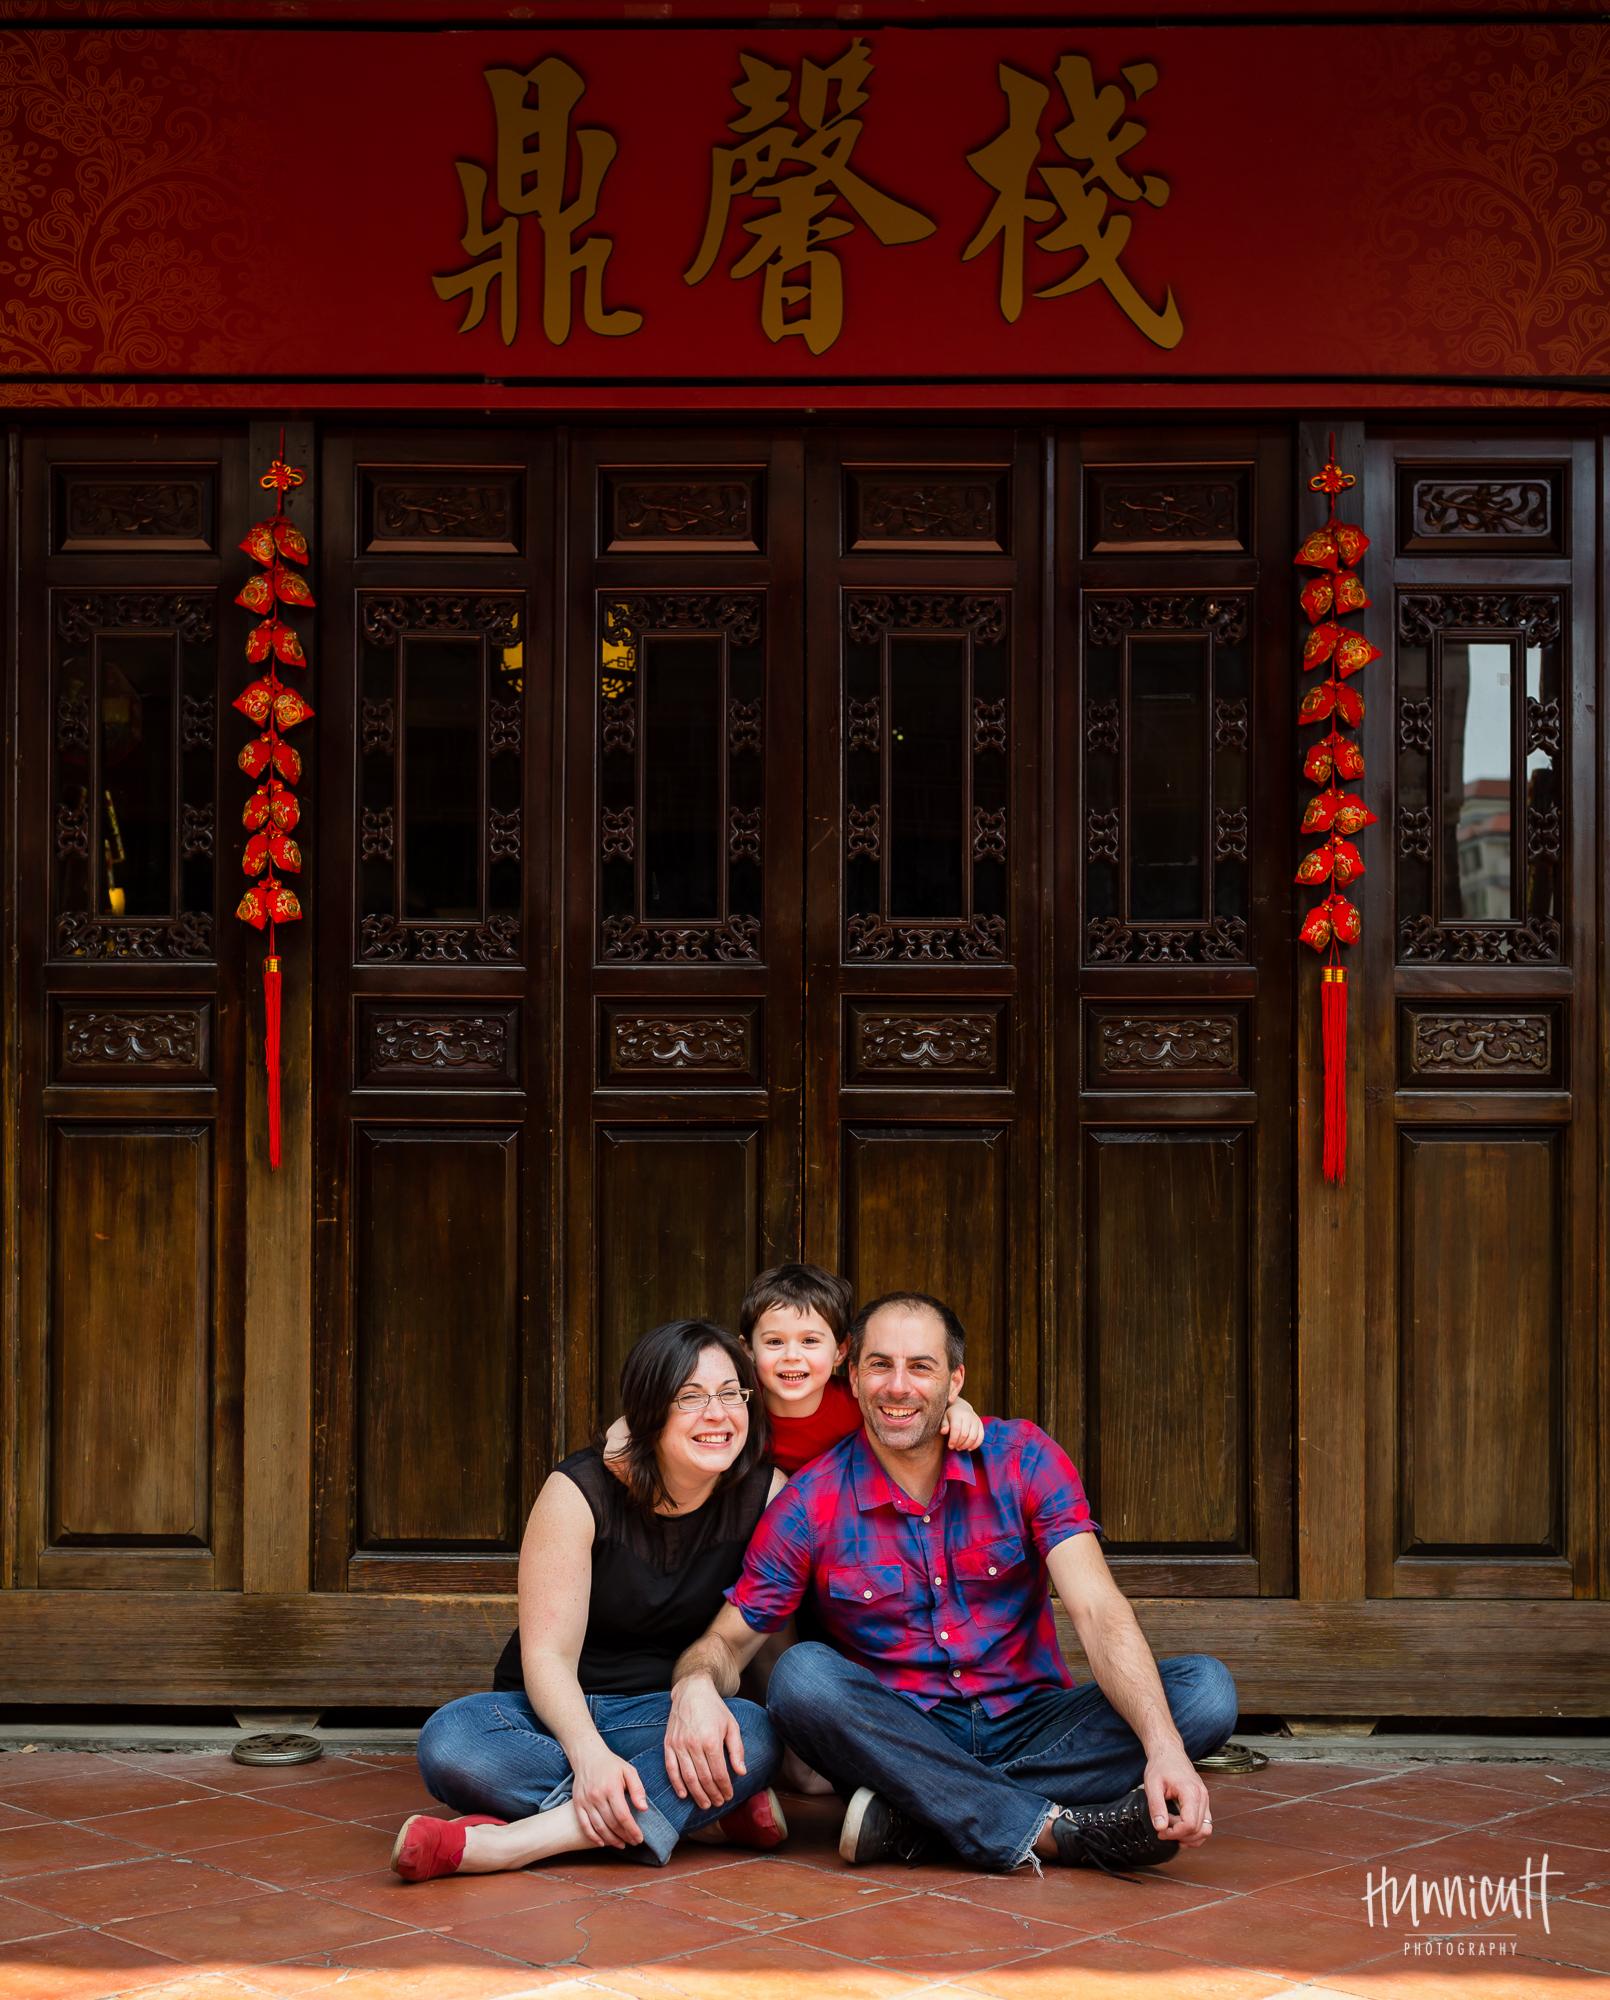 Family-Outdoor-Lifestyle-Modern-Urban-Travel-Culture-HunnicuttPhotography-RebeccaHunnicuttFarren-Taichung-Taiwan-7